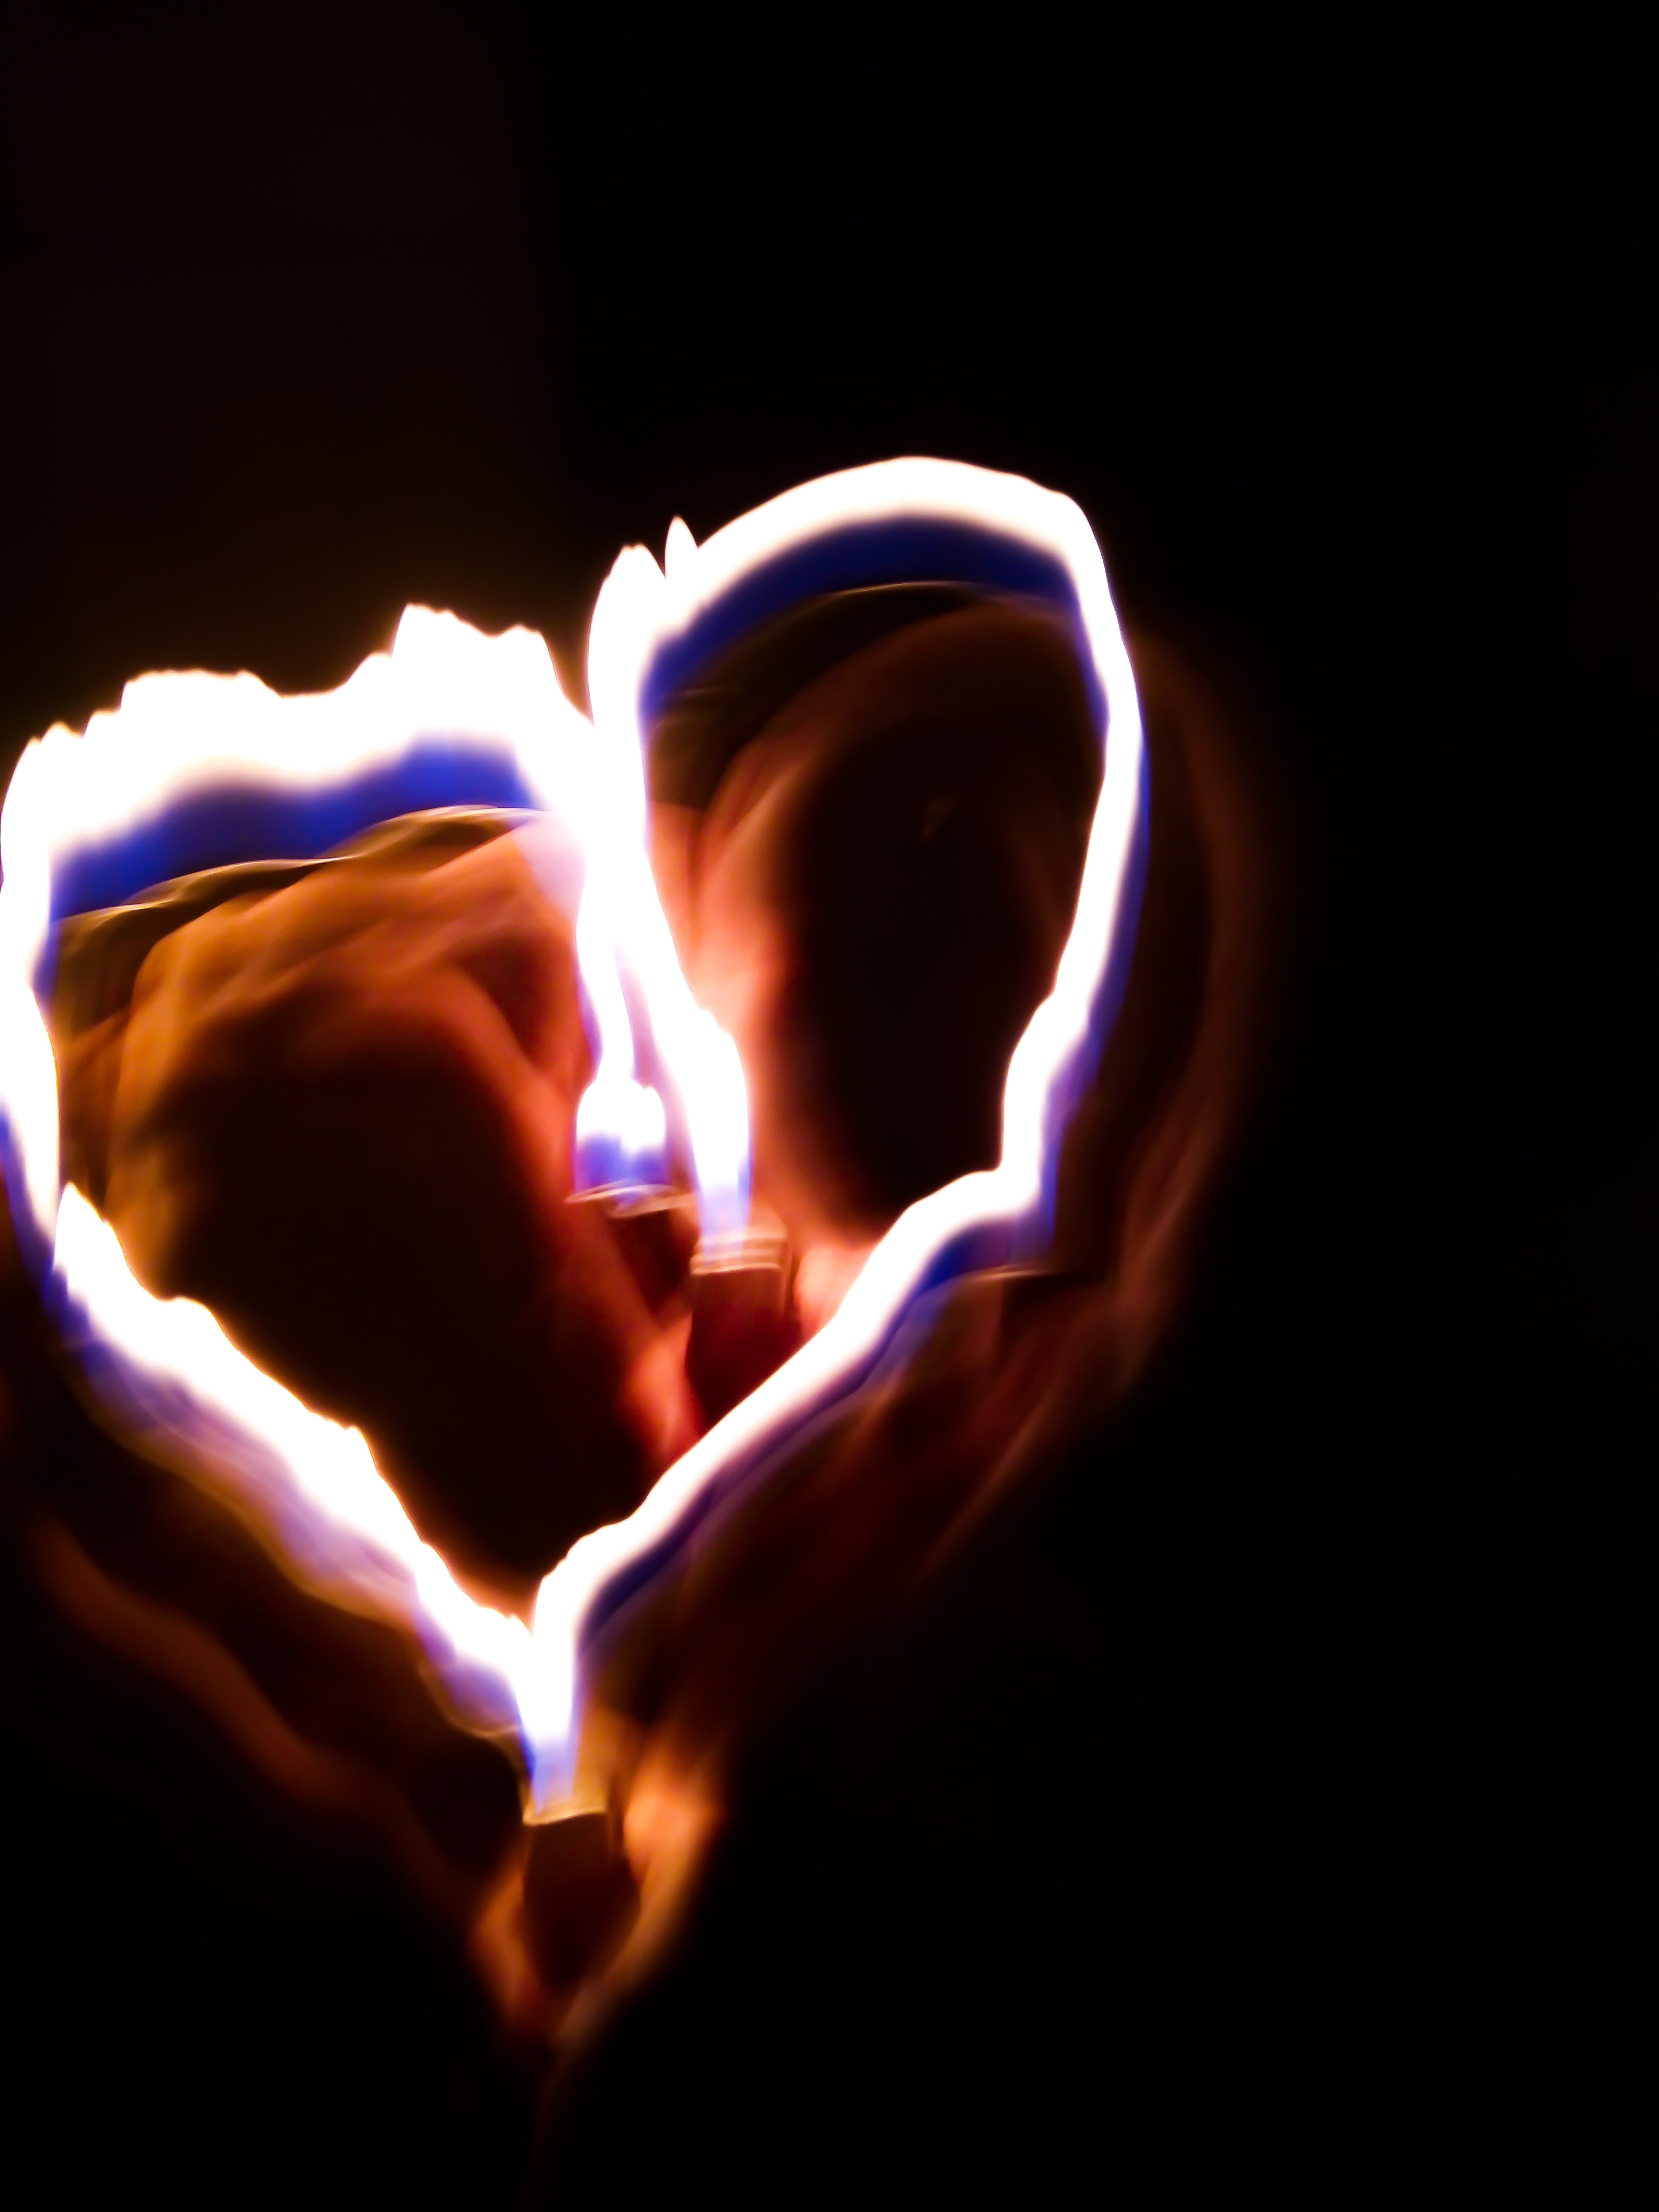 Free stock photo of fire, heart, light